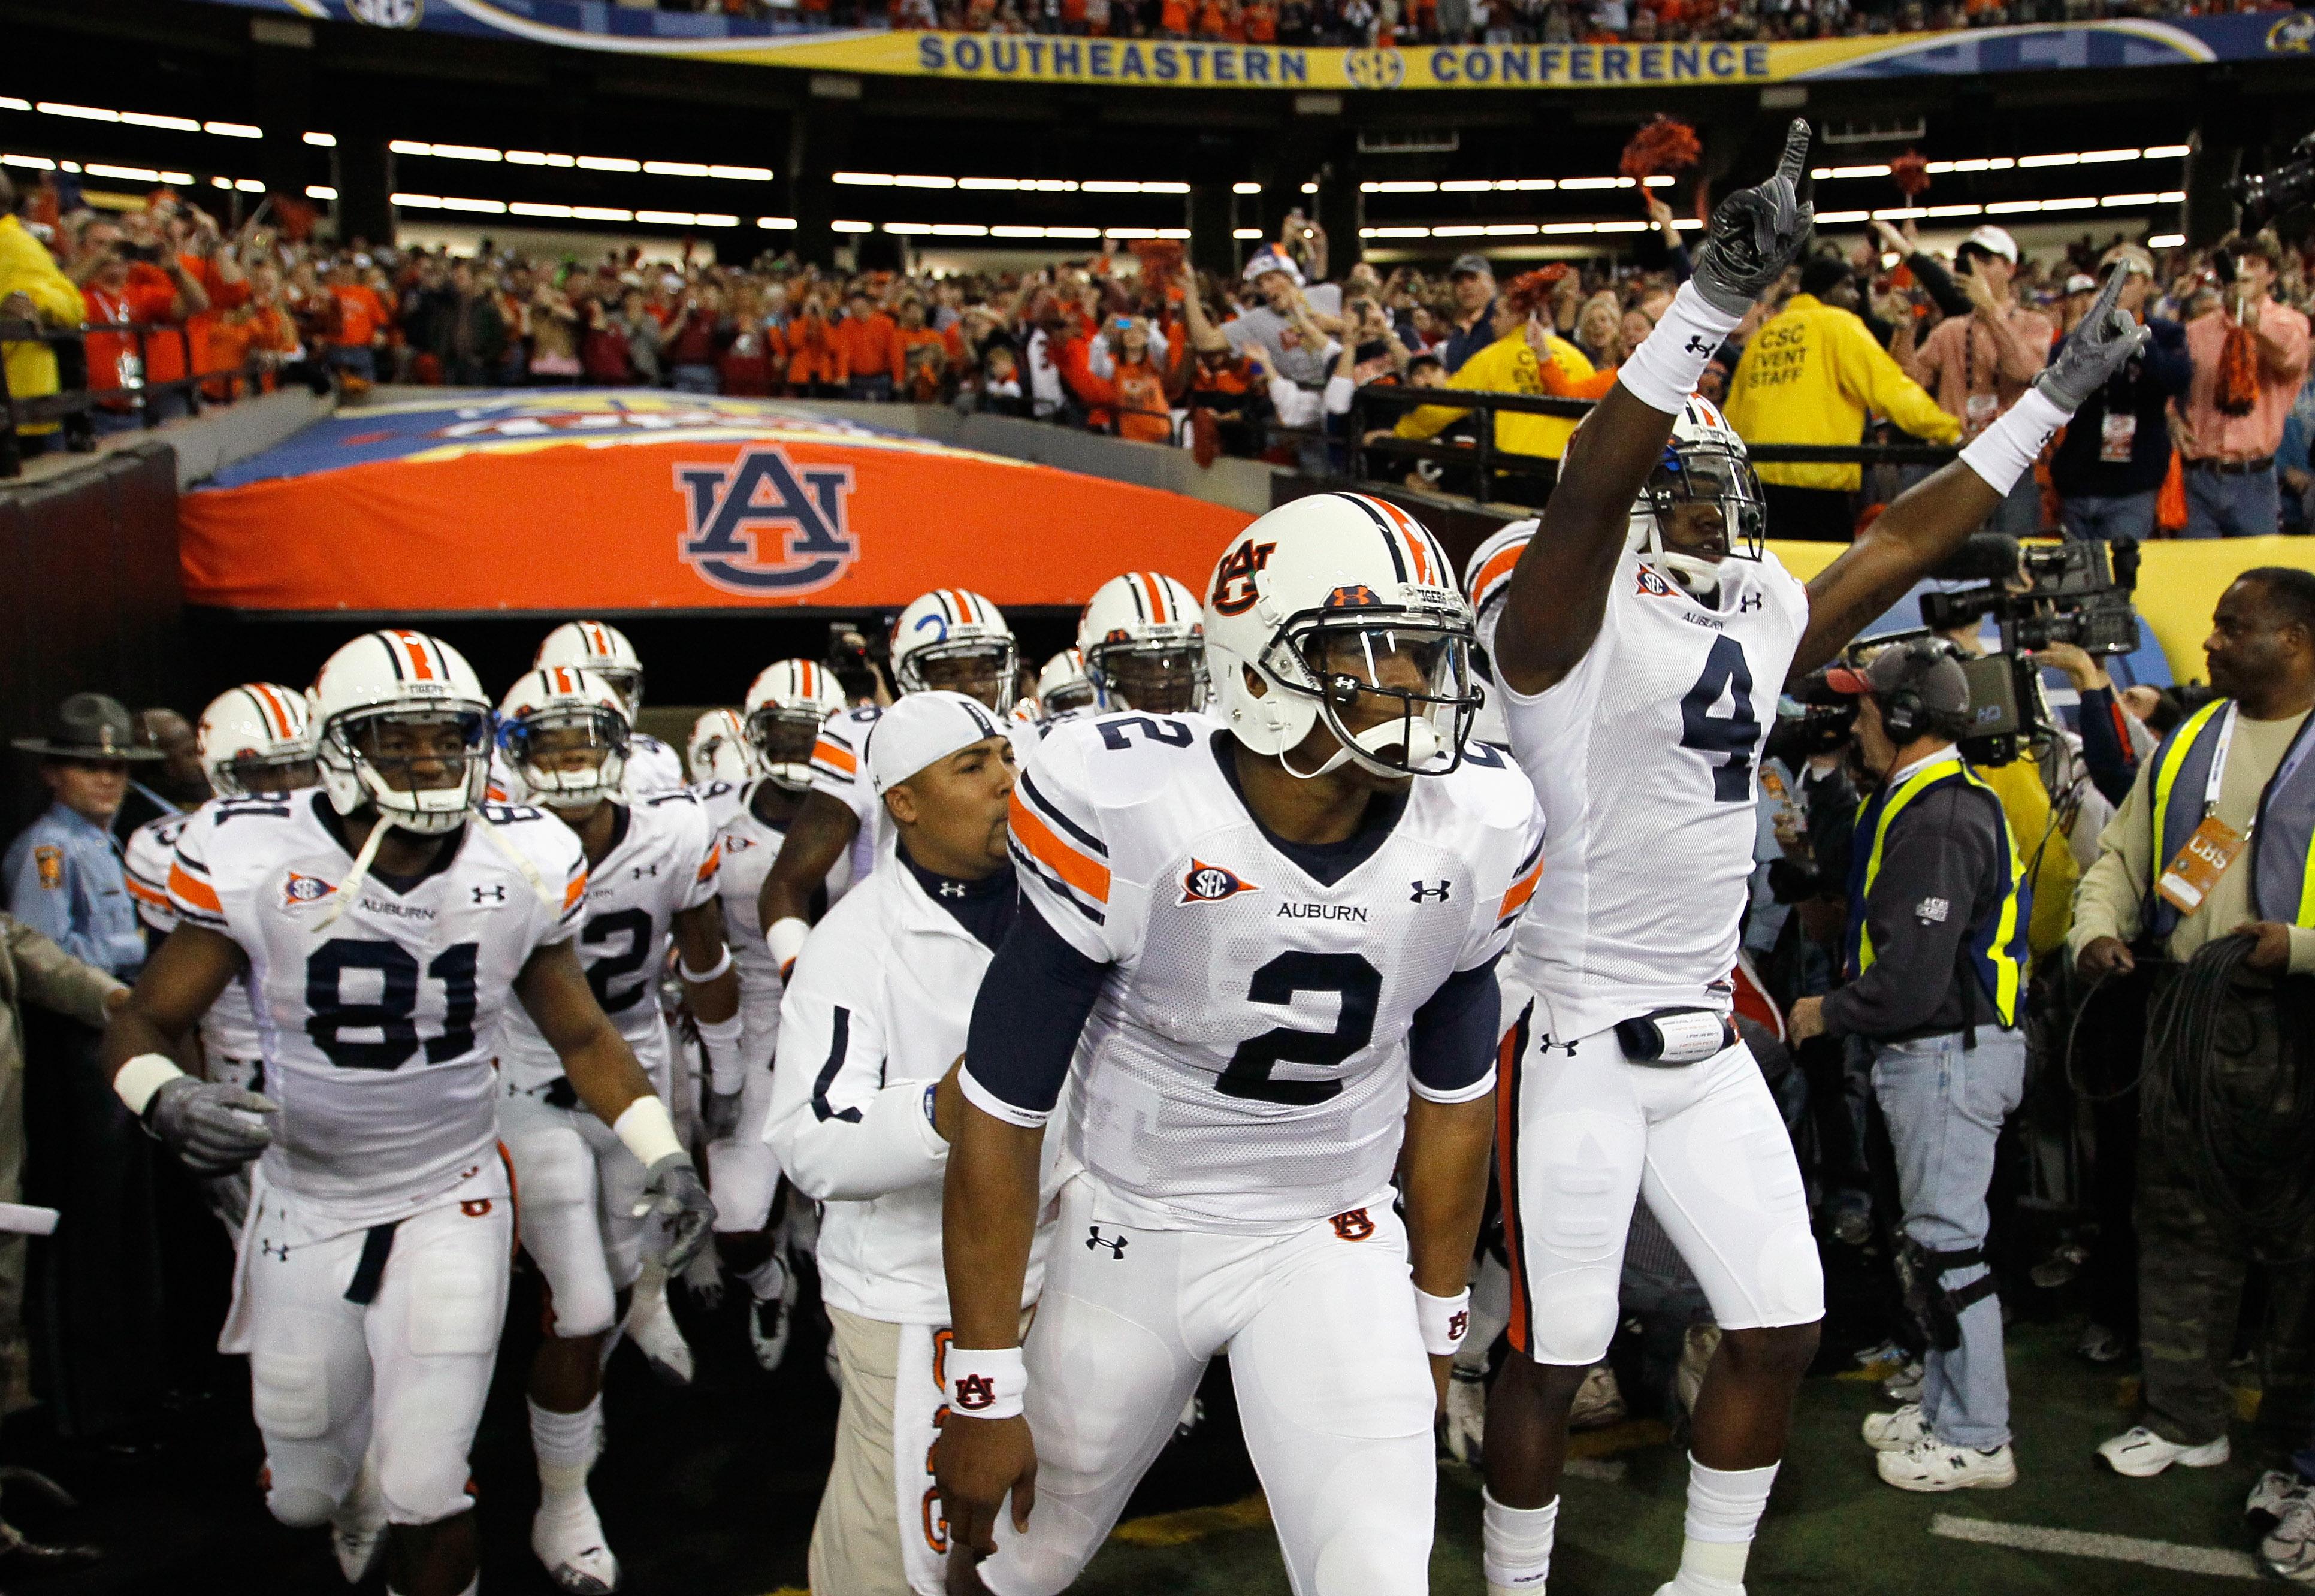 Auburn won the SEC Championship destroying South Carolina